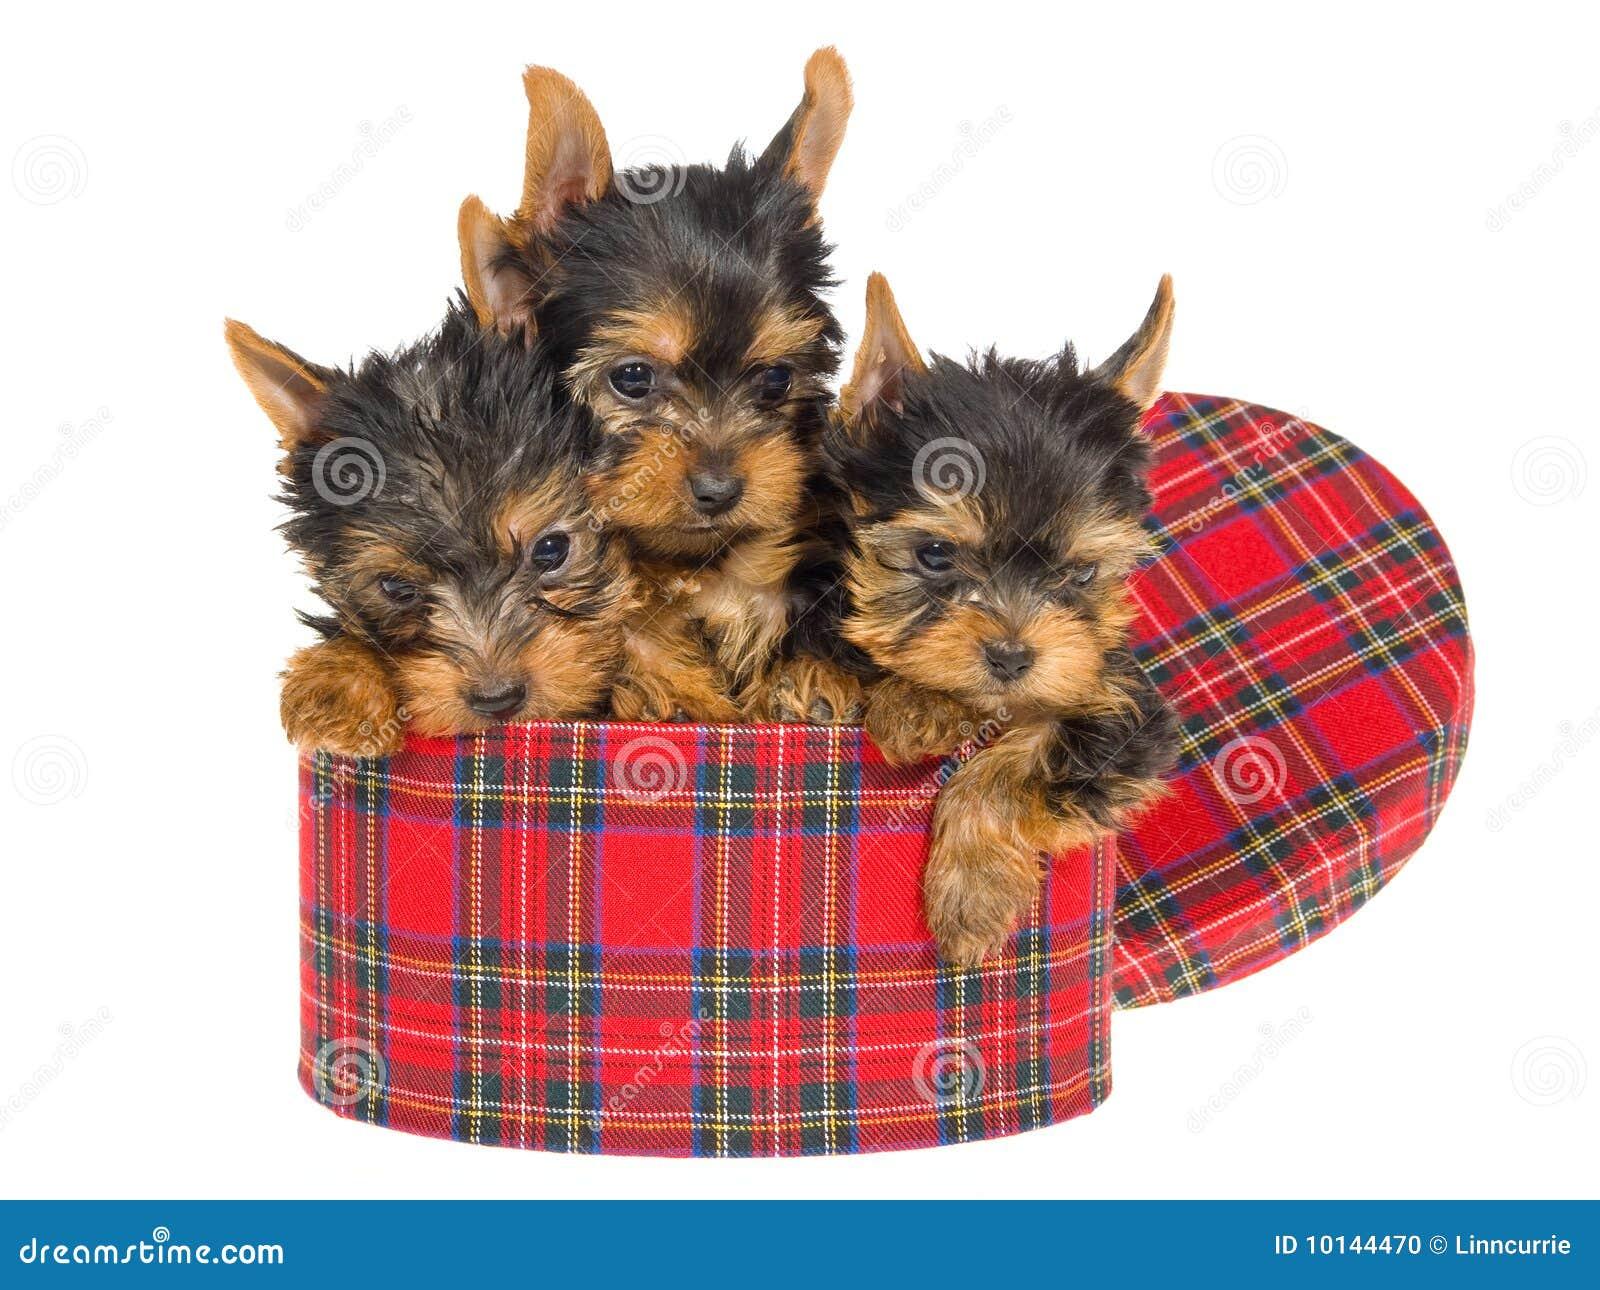 3 Cute Yorkie Pups Sitting Inside Tartan Gift Box Stock